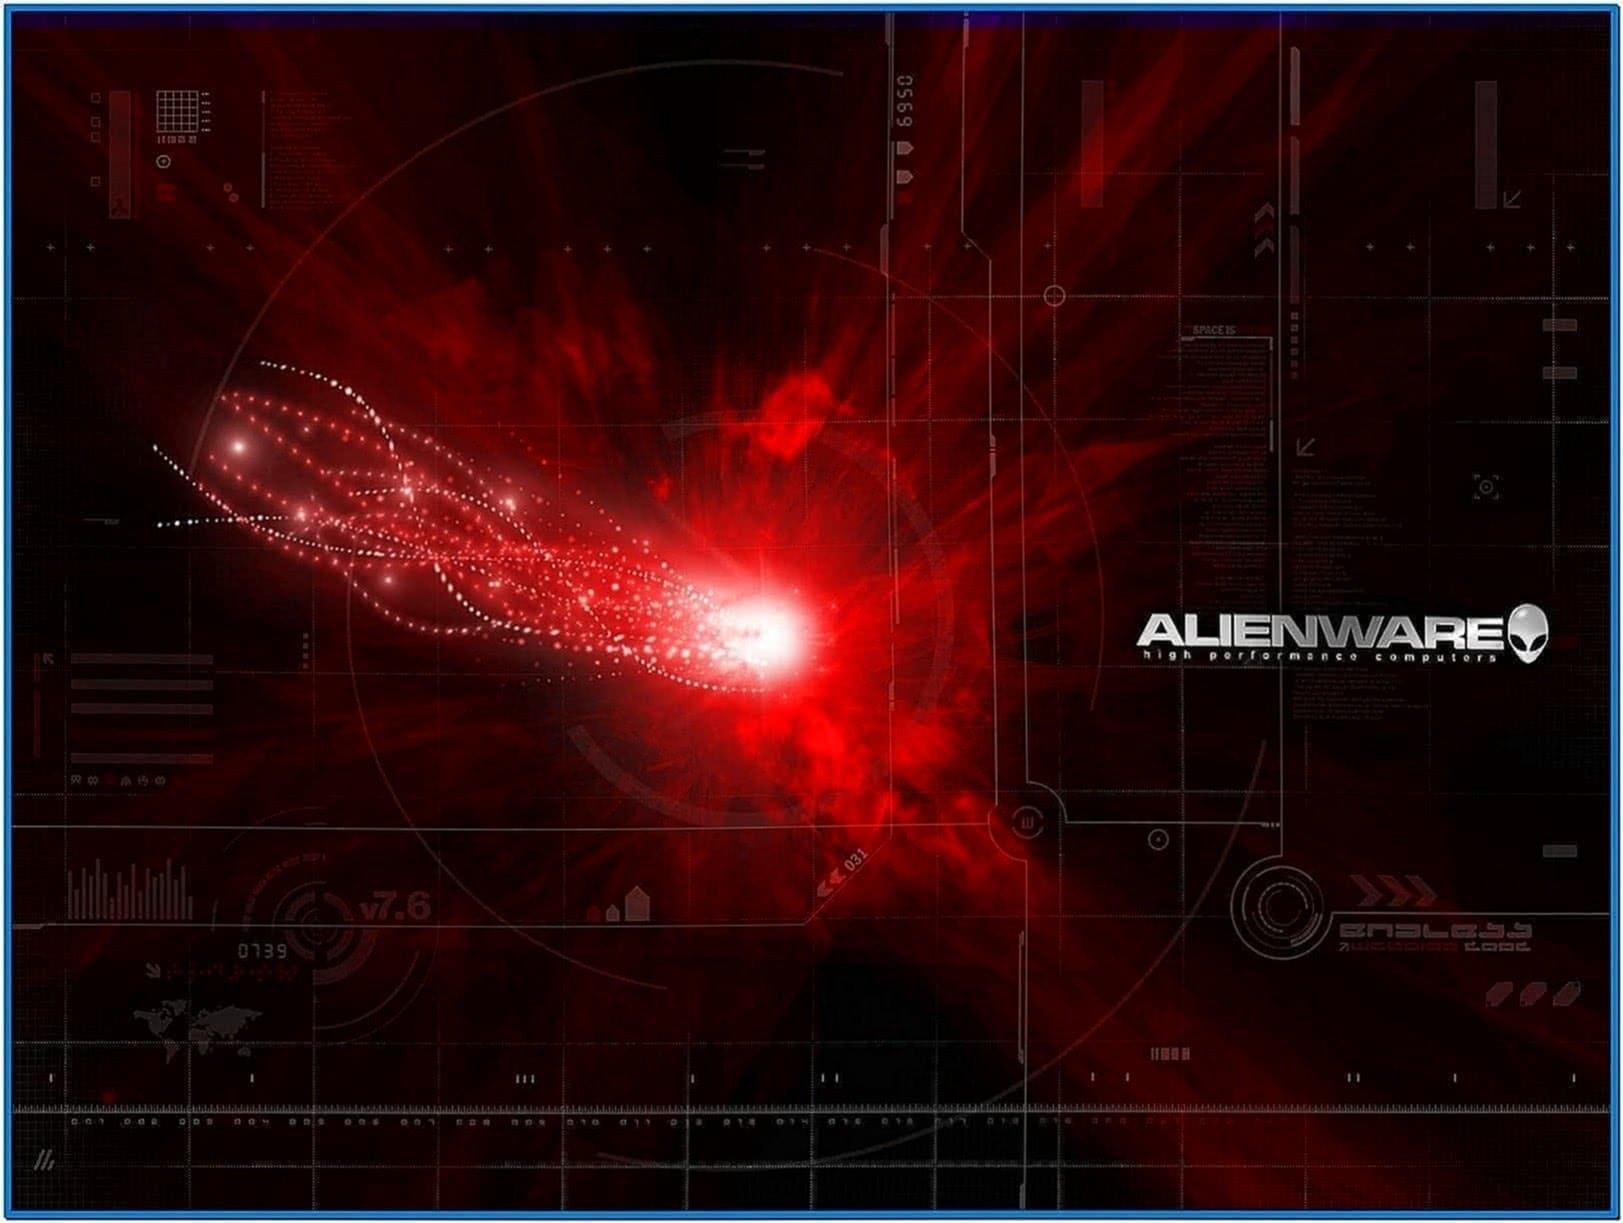 Alienware screensaver Windows 7